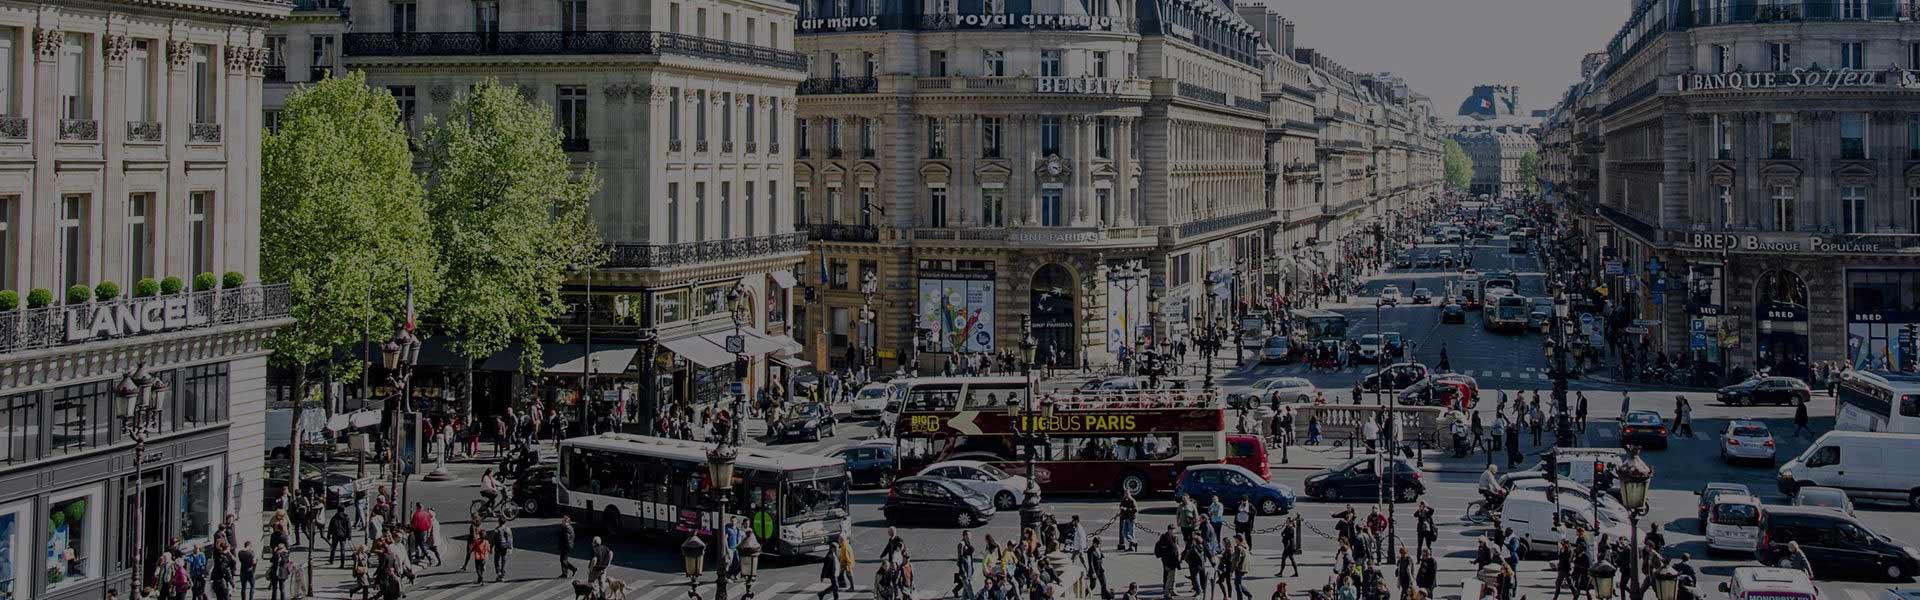 Vista de la Avenida de la Ópera de París